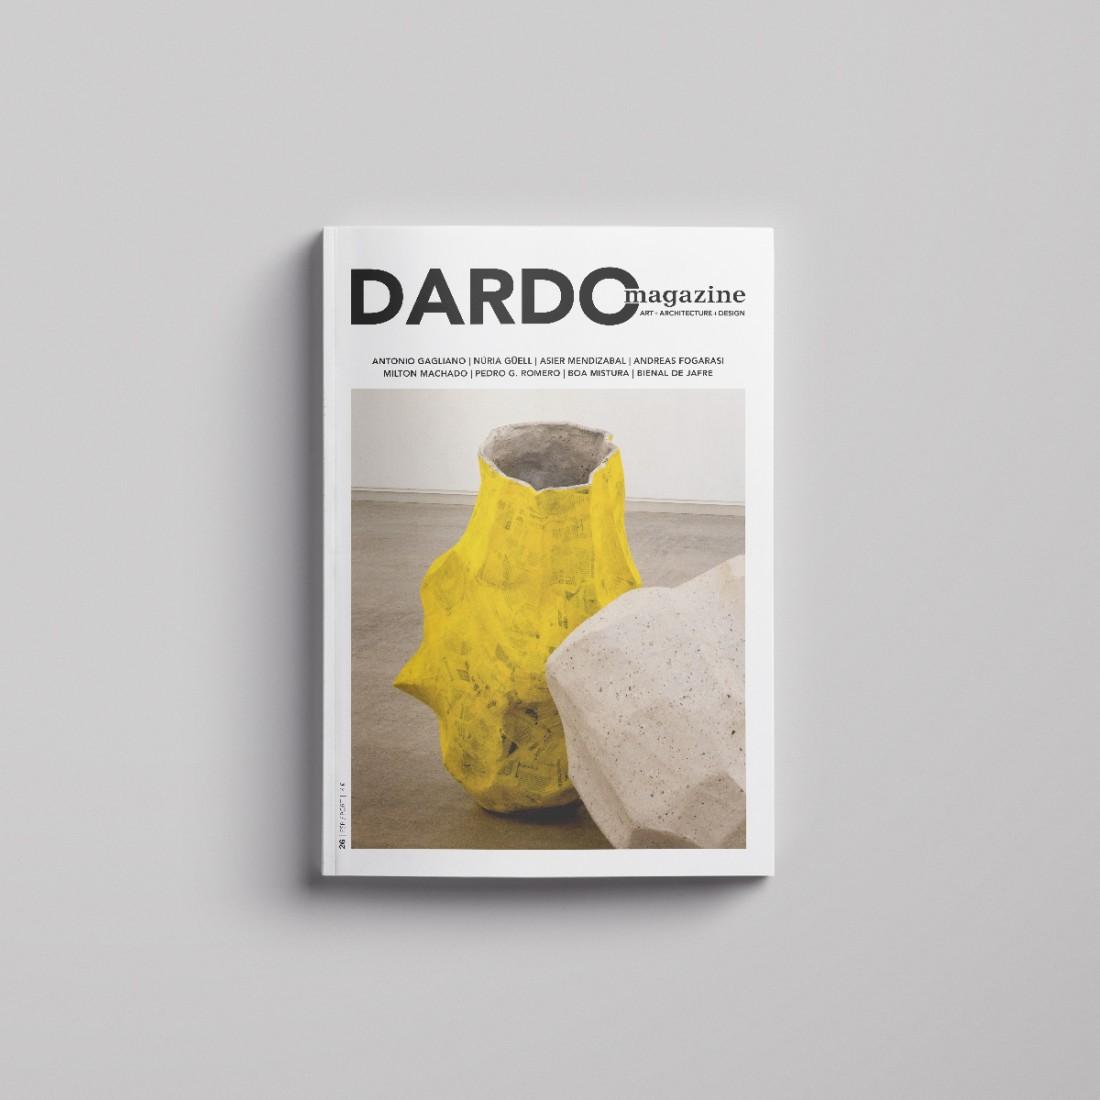 DARDOmagazine 26